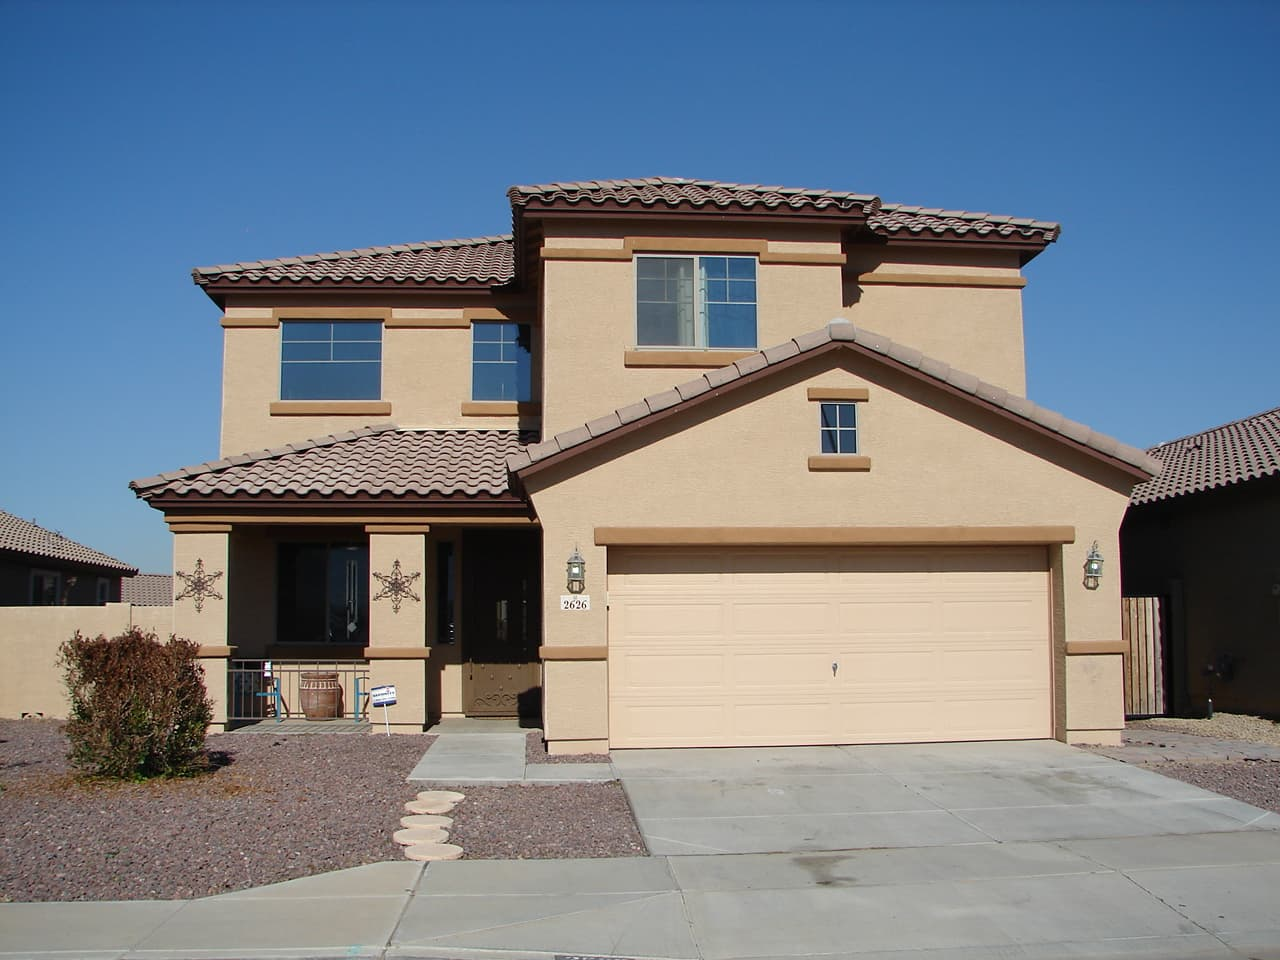 New Homes On Baseline Phoenix